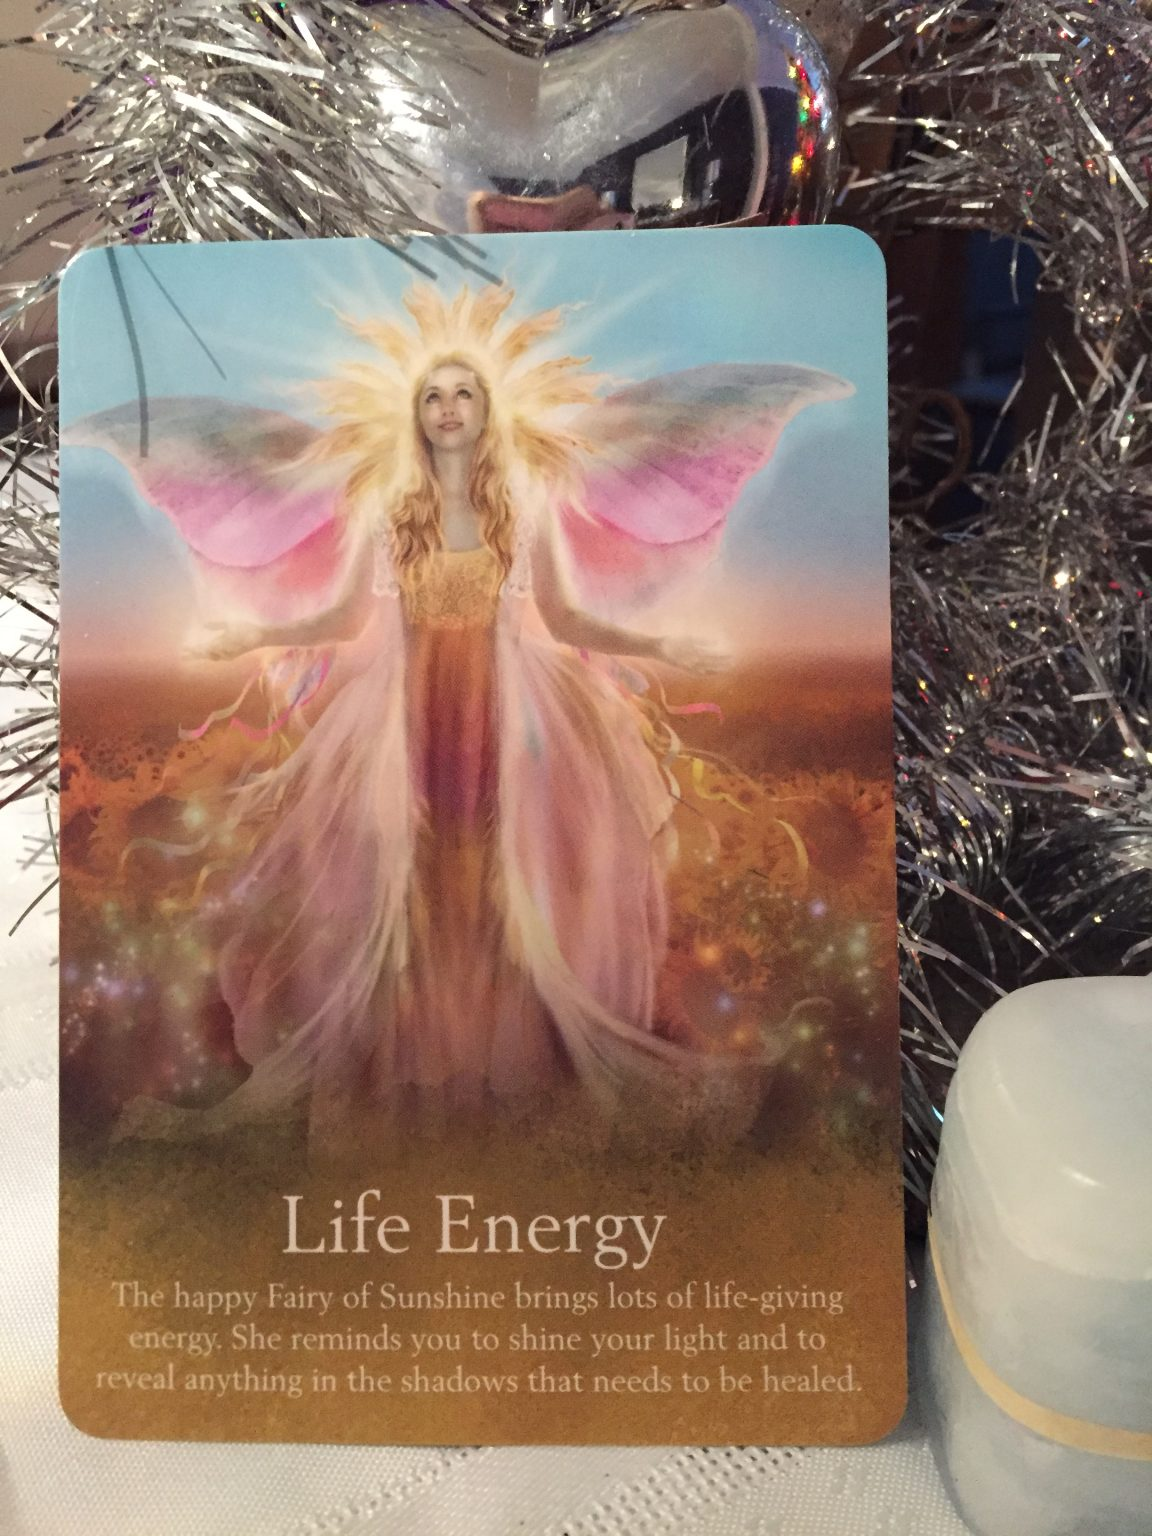 izita.ca Life Energy Dec 28 2020 IMG-4317